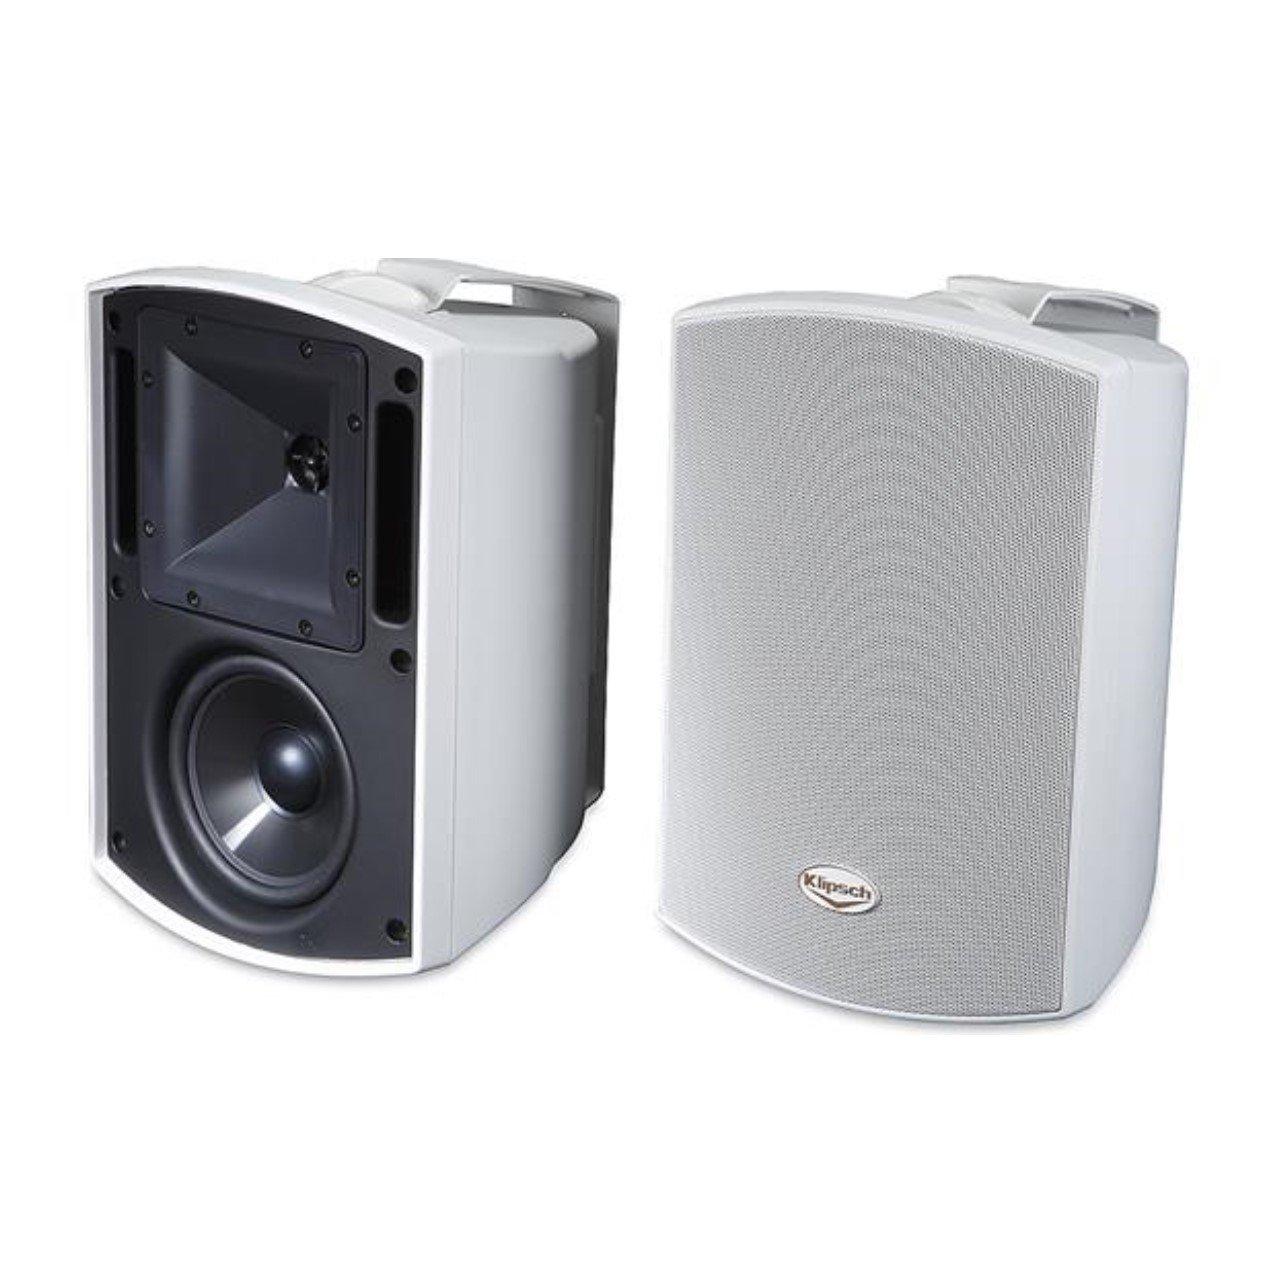 Klipsch AW-525 Indoor/Outdoor Speaker - White (Pair)